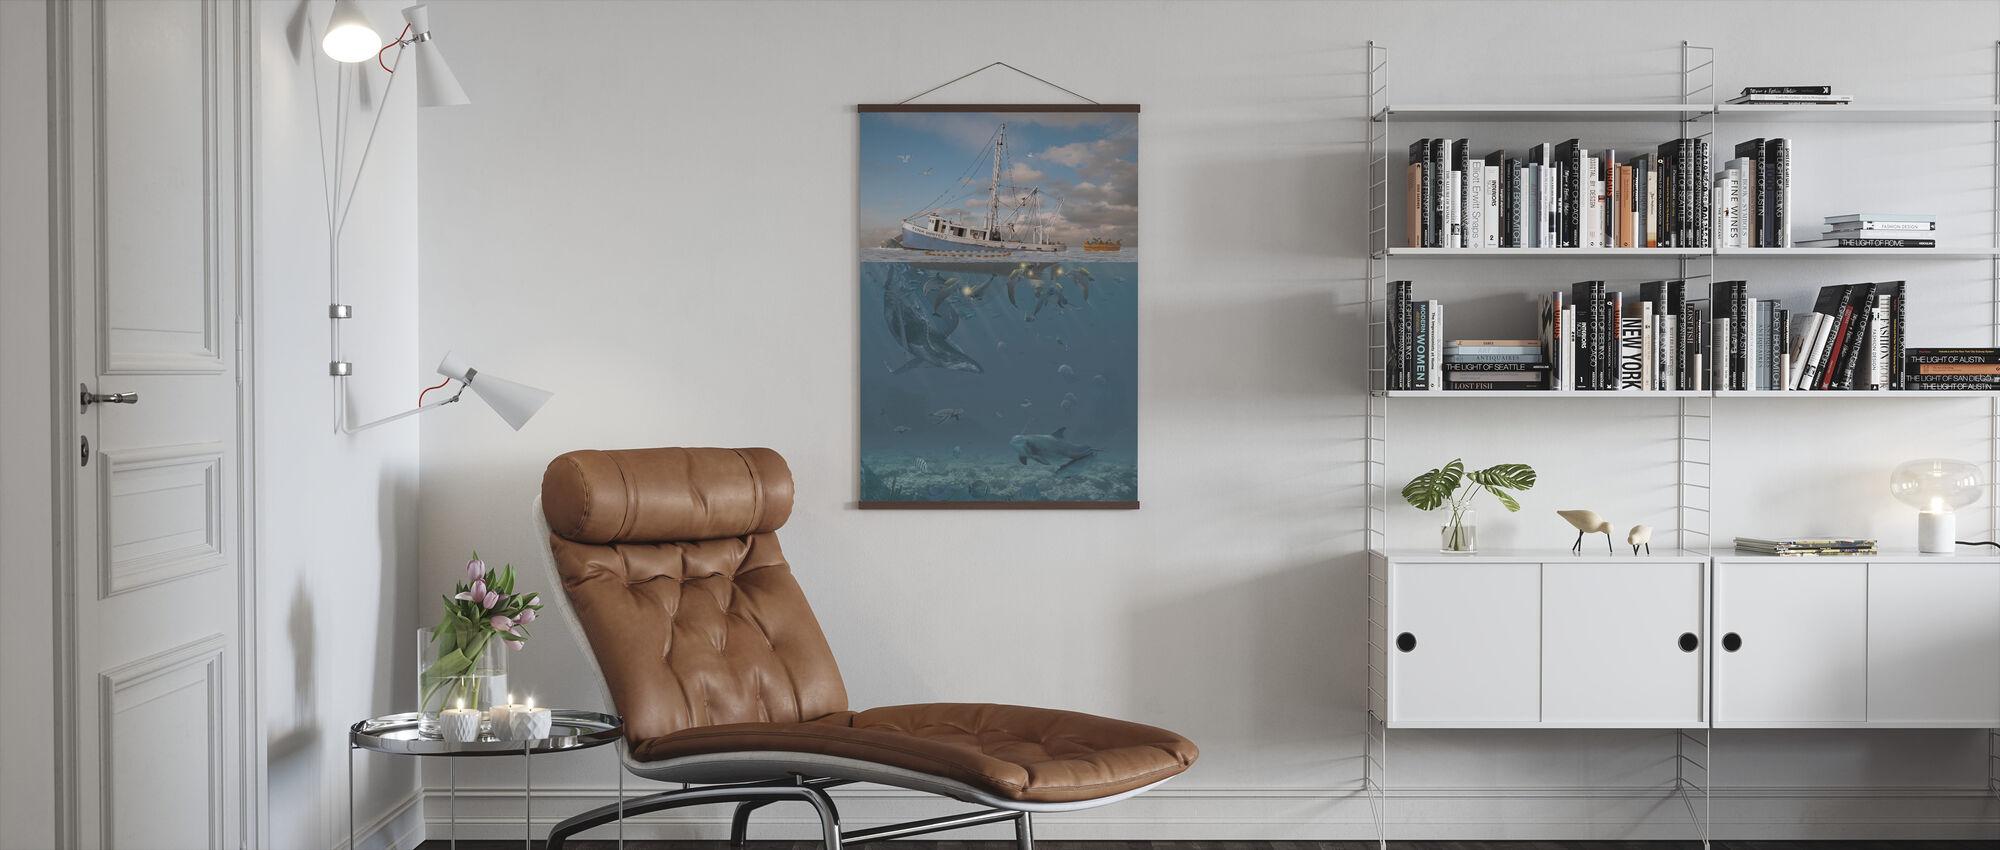 Delfiinin raivo - Juliste - Olohuone